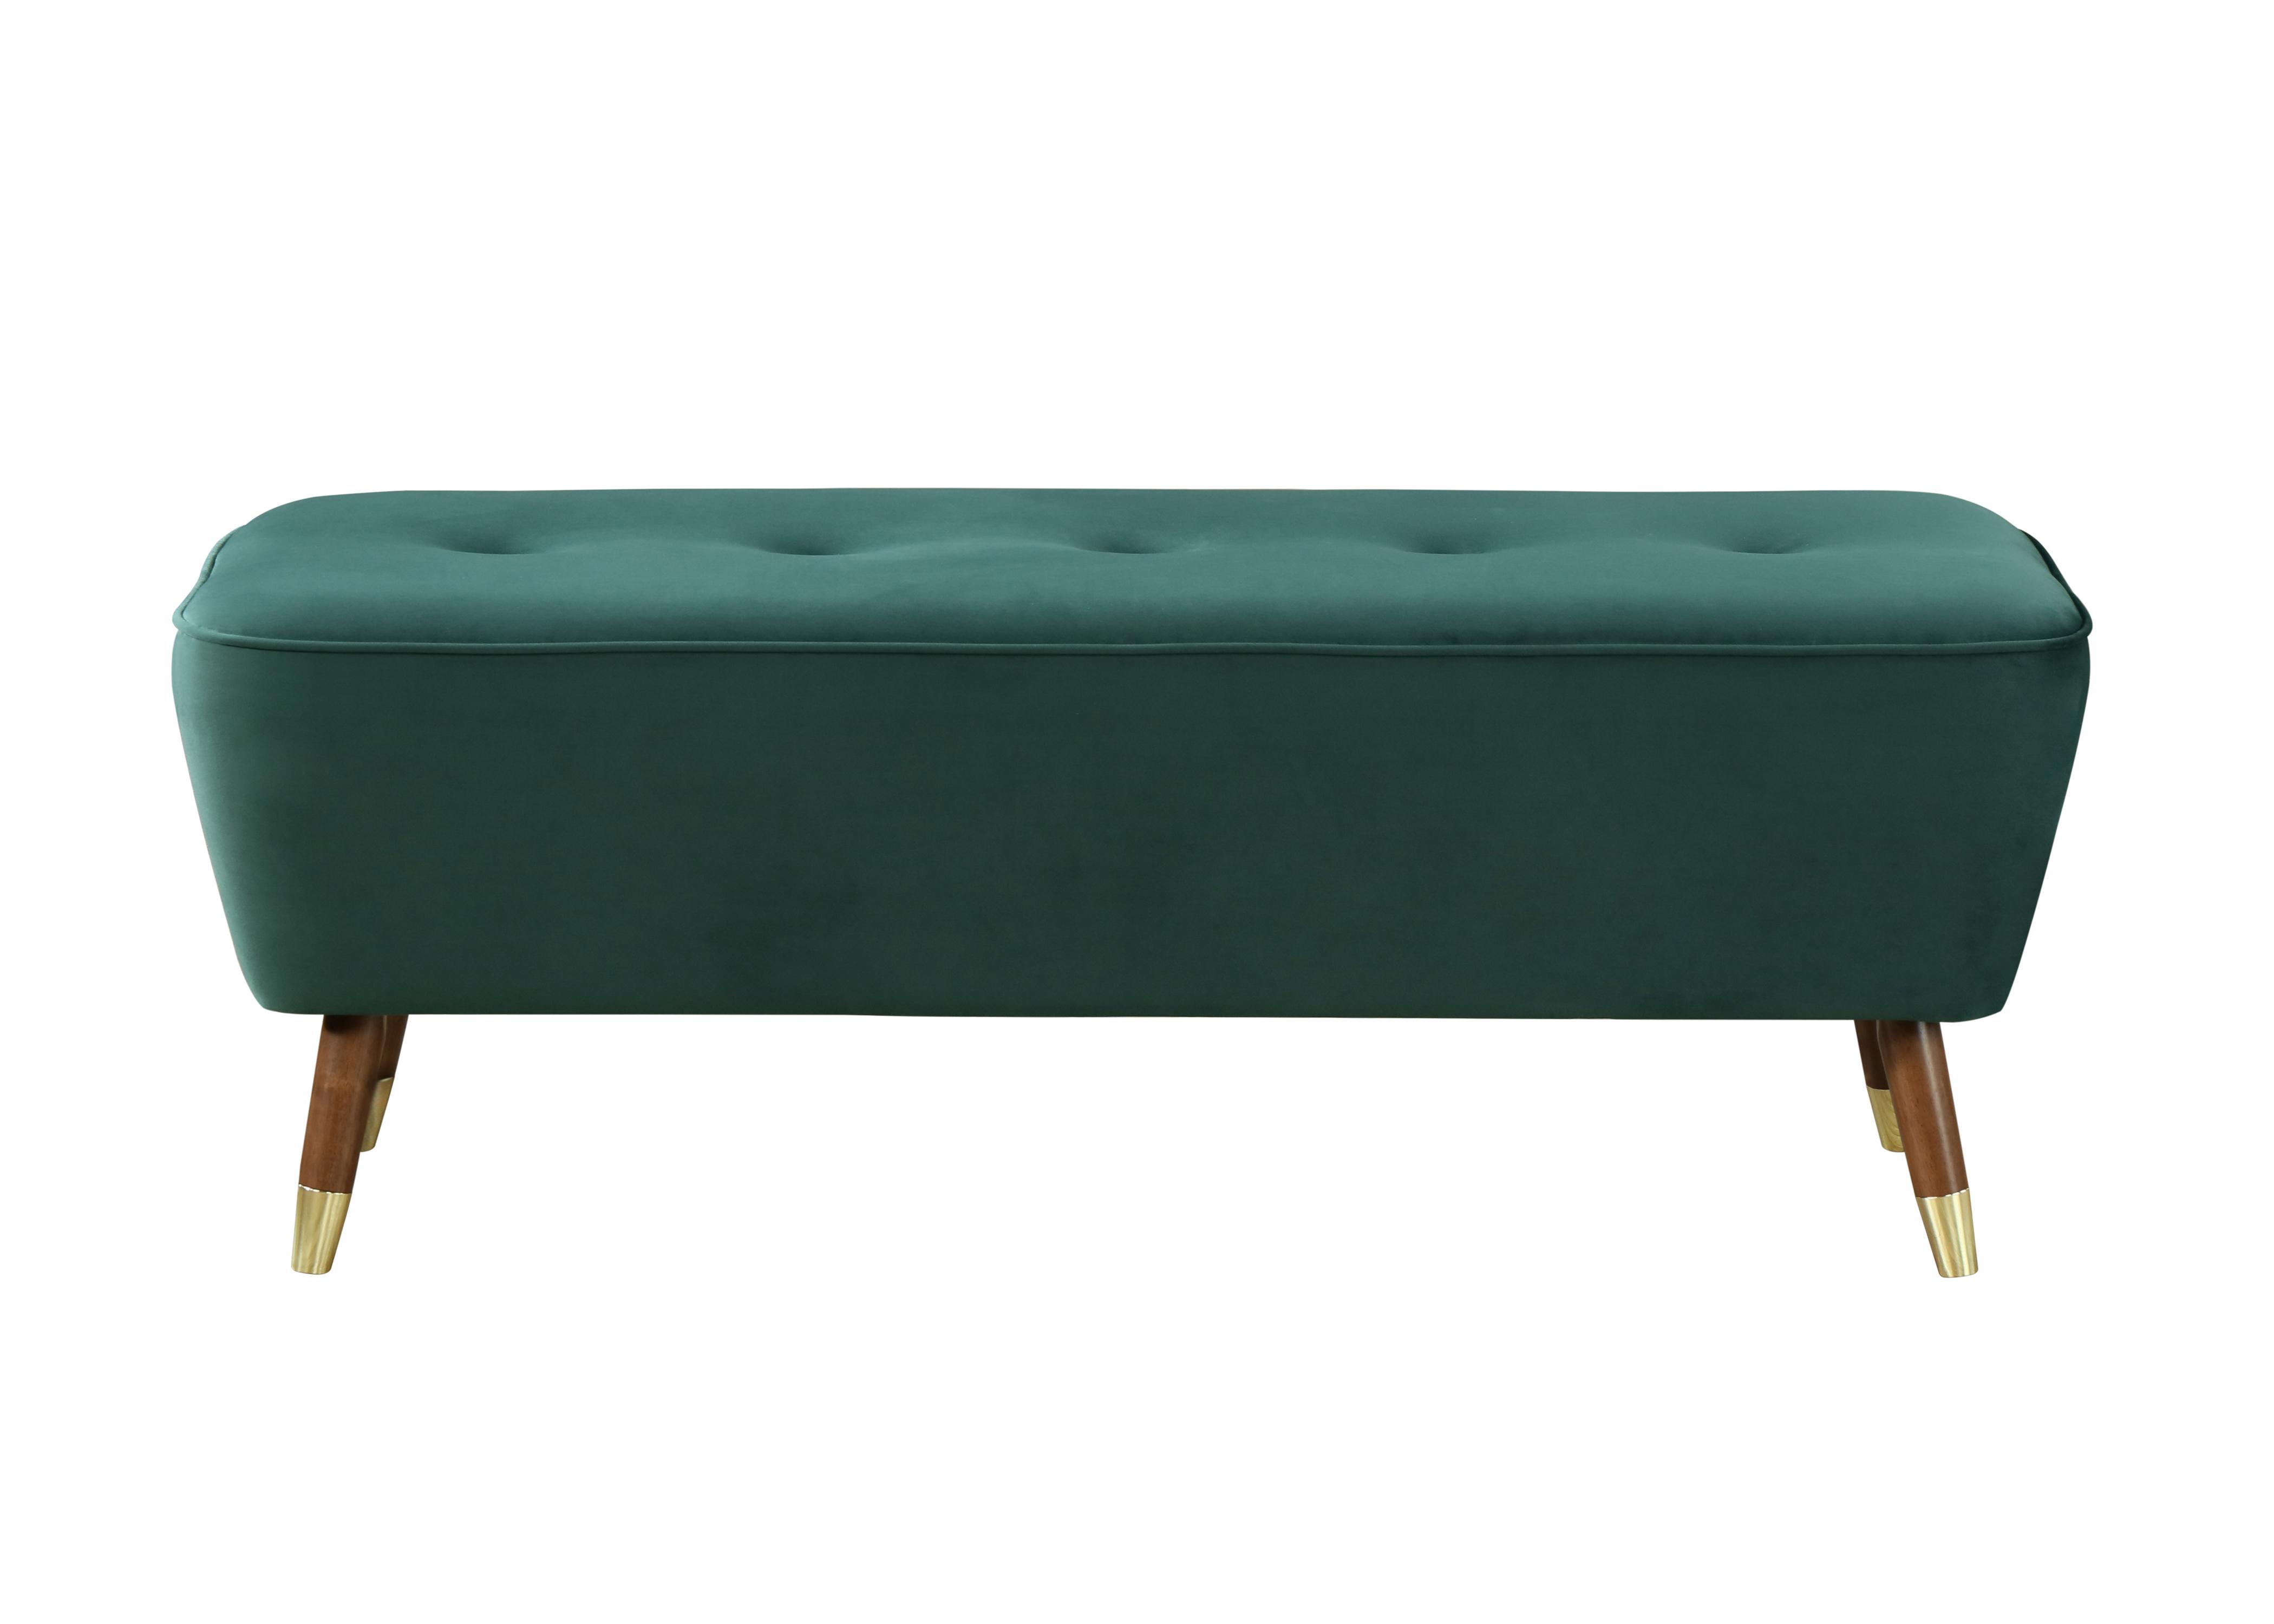 Banca tapitata cu stofa si picioare din lemn Palm Velvet Verde, l125xA47,5xH46,5 cm imagine